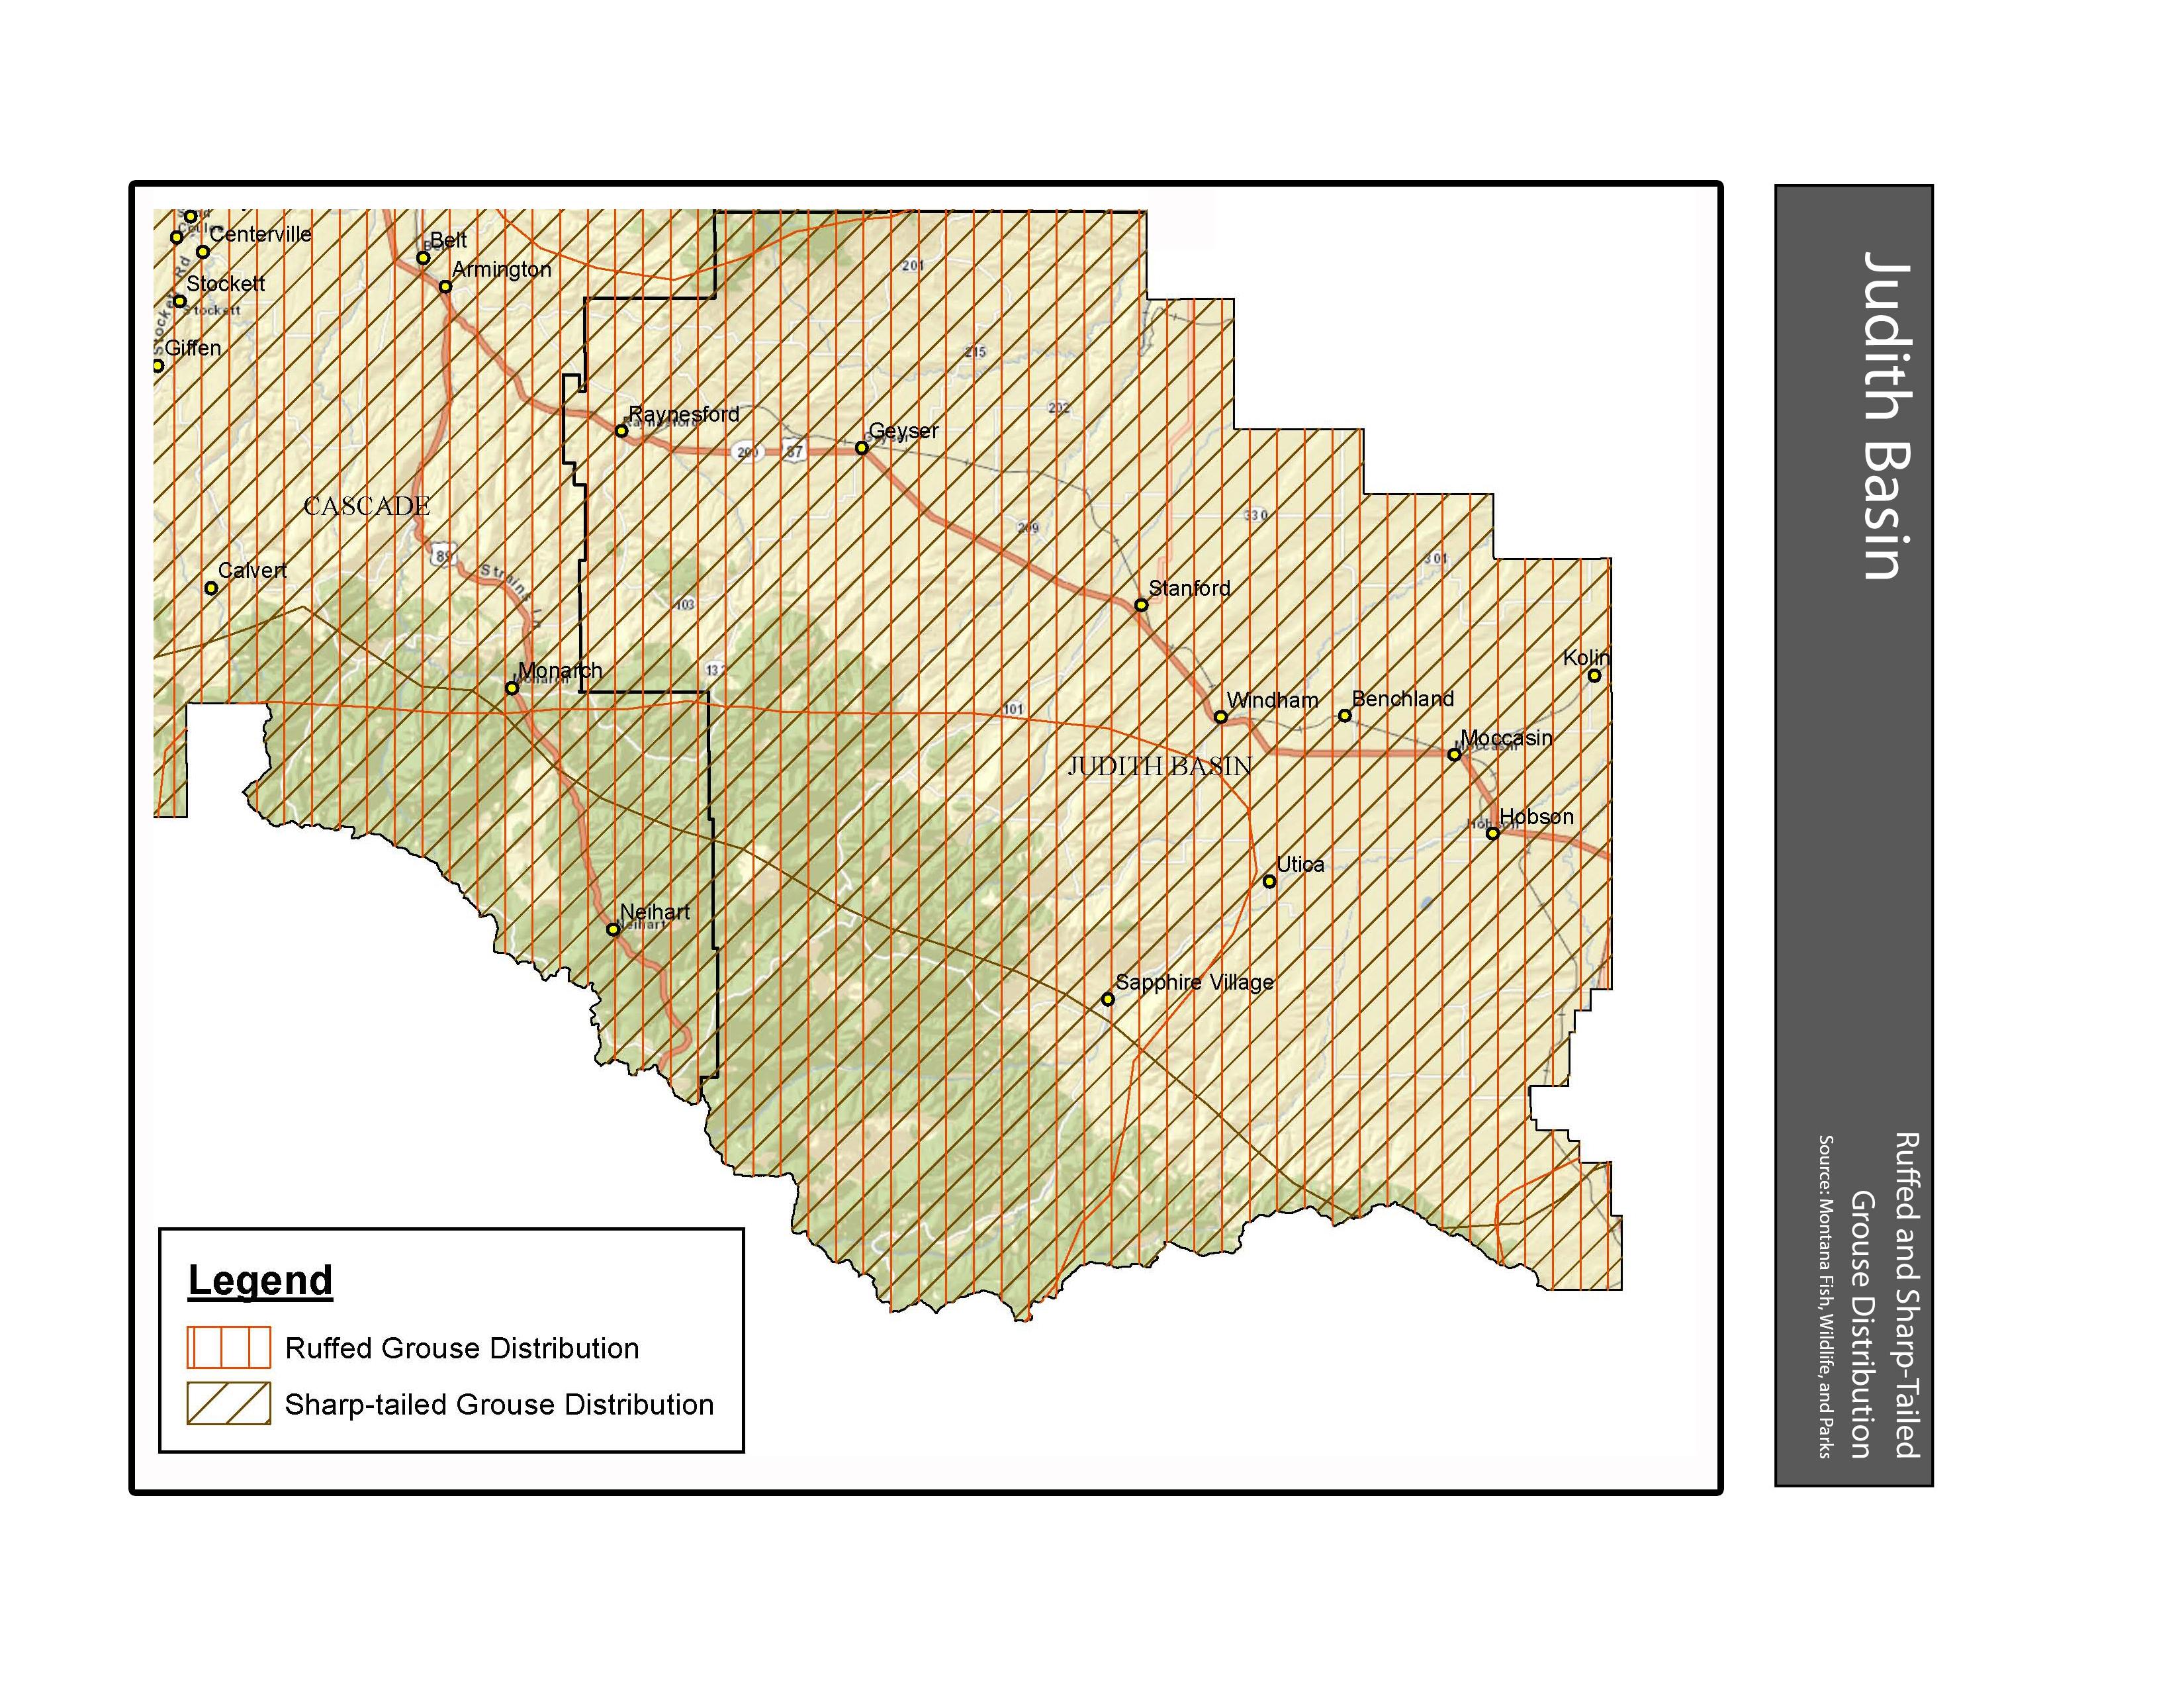 Ruffed and Sharp-tailed Grouse Distribution Judith Basin County